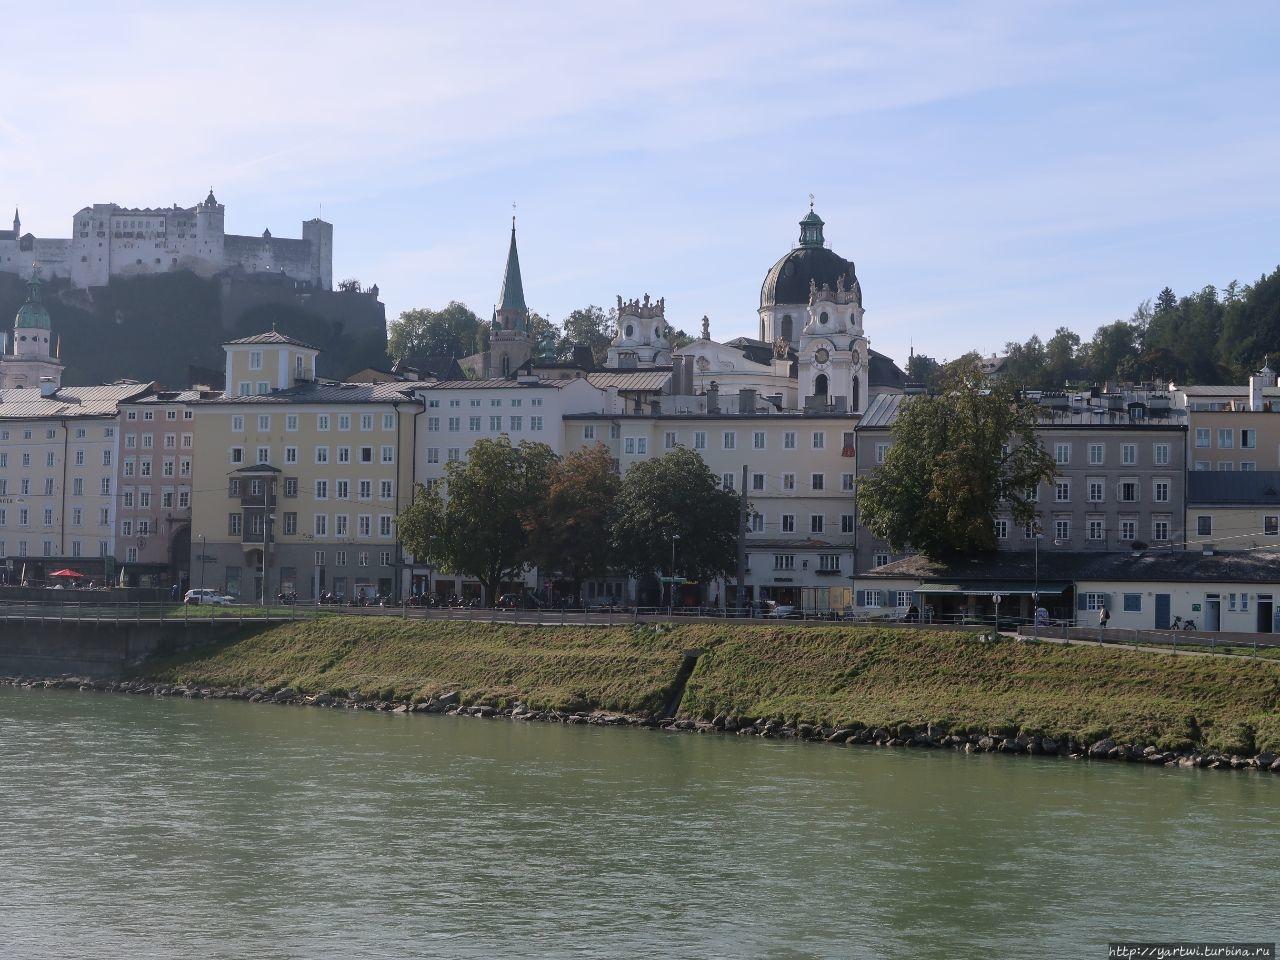 Вид на крепость Хоензальц